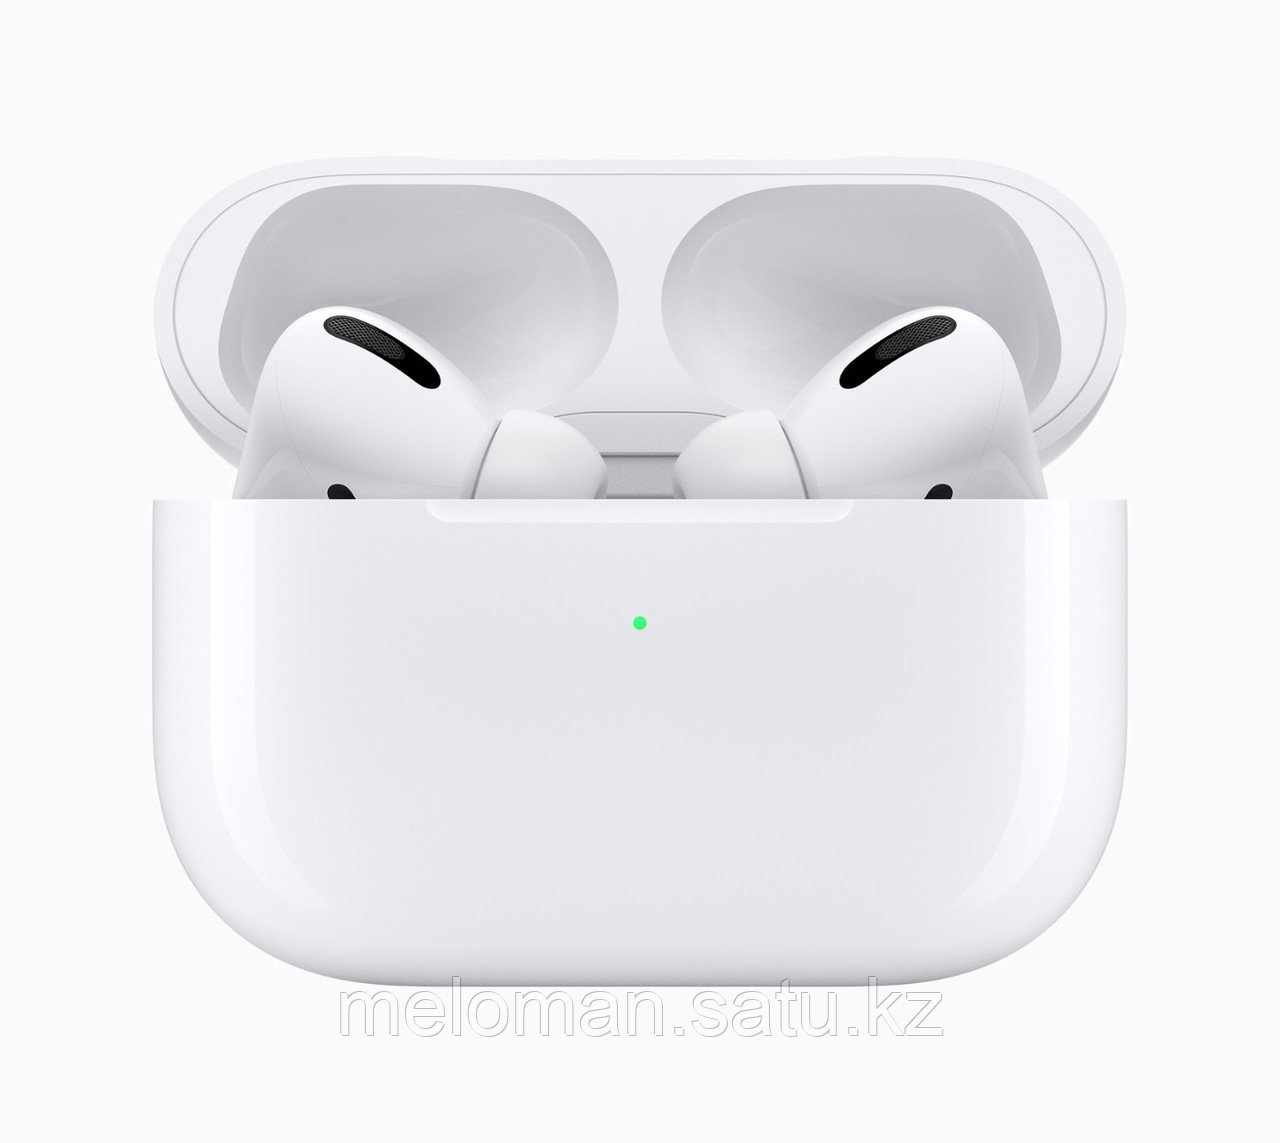 Беспроводные наушники Apple AirPods PRO wireless charging case - фото 4